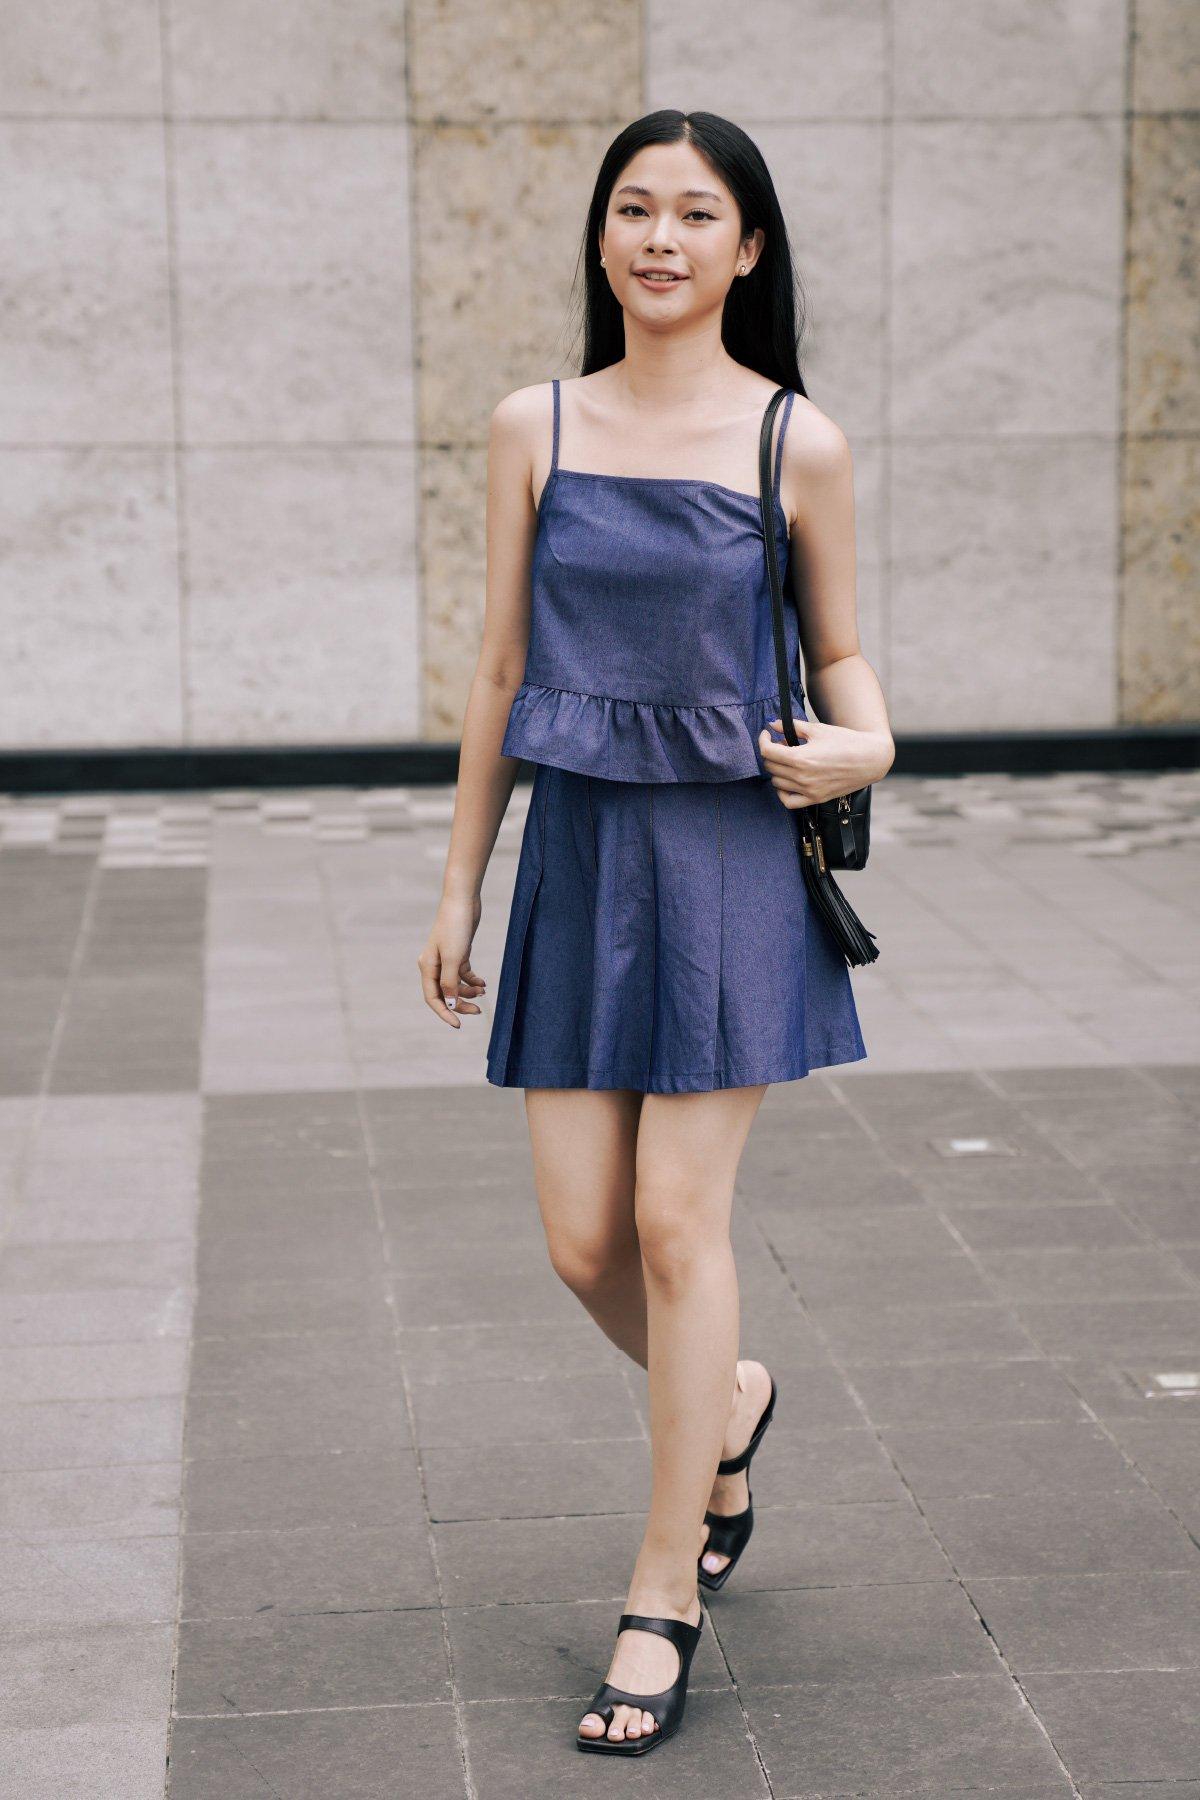 Chân váy xếp li Denim Xanh đậm Pleated Mini Dark Denim Skirt